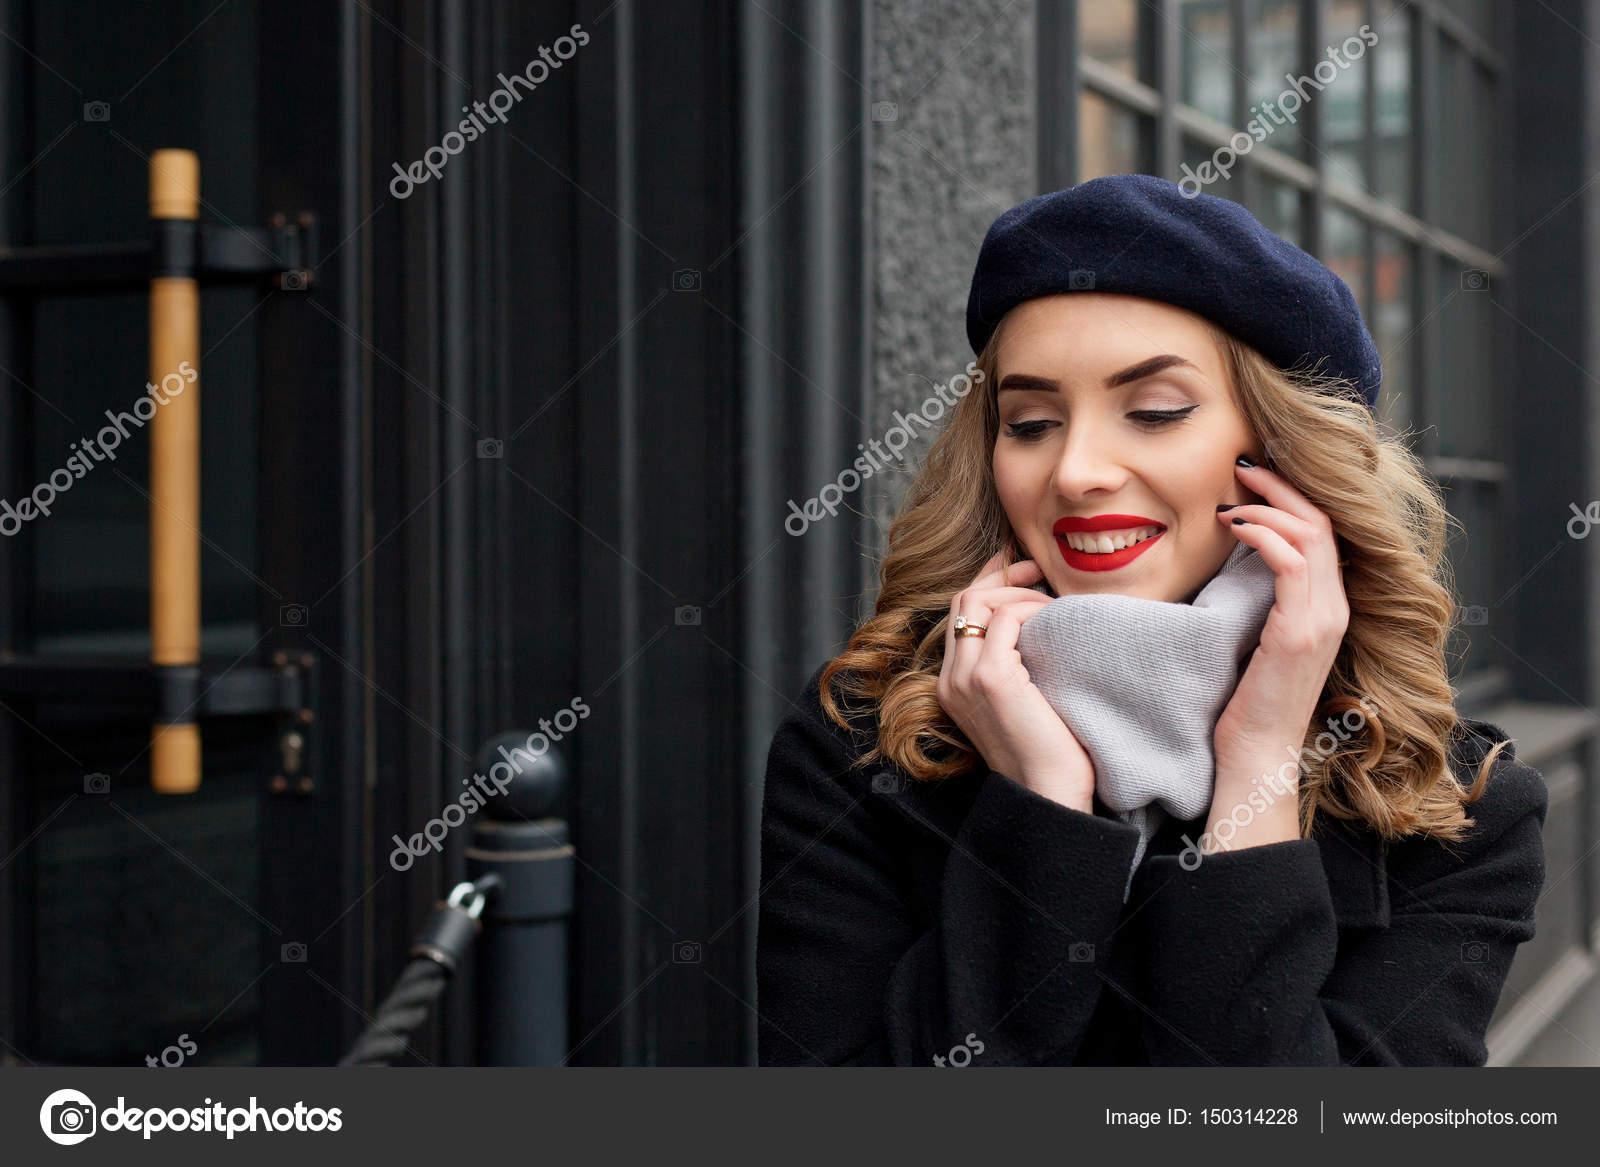 346029f9c443 Φωτογραφία δρόμου νεαρή όμορφη γυναίκα που φοράει μοντέρνα κλασικά ρούχα — Φωτογραφία  Αρχείου